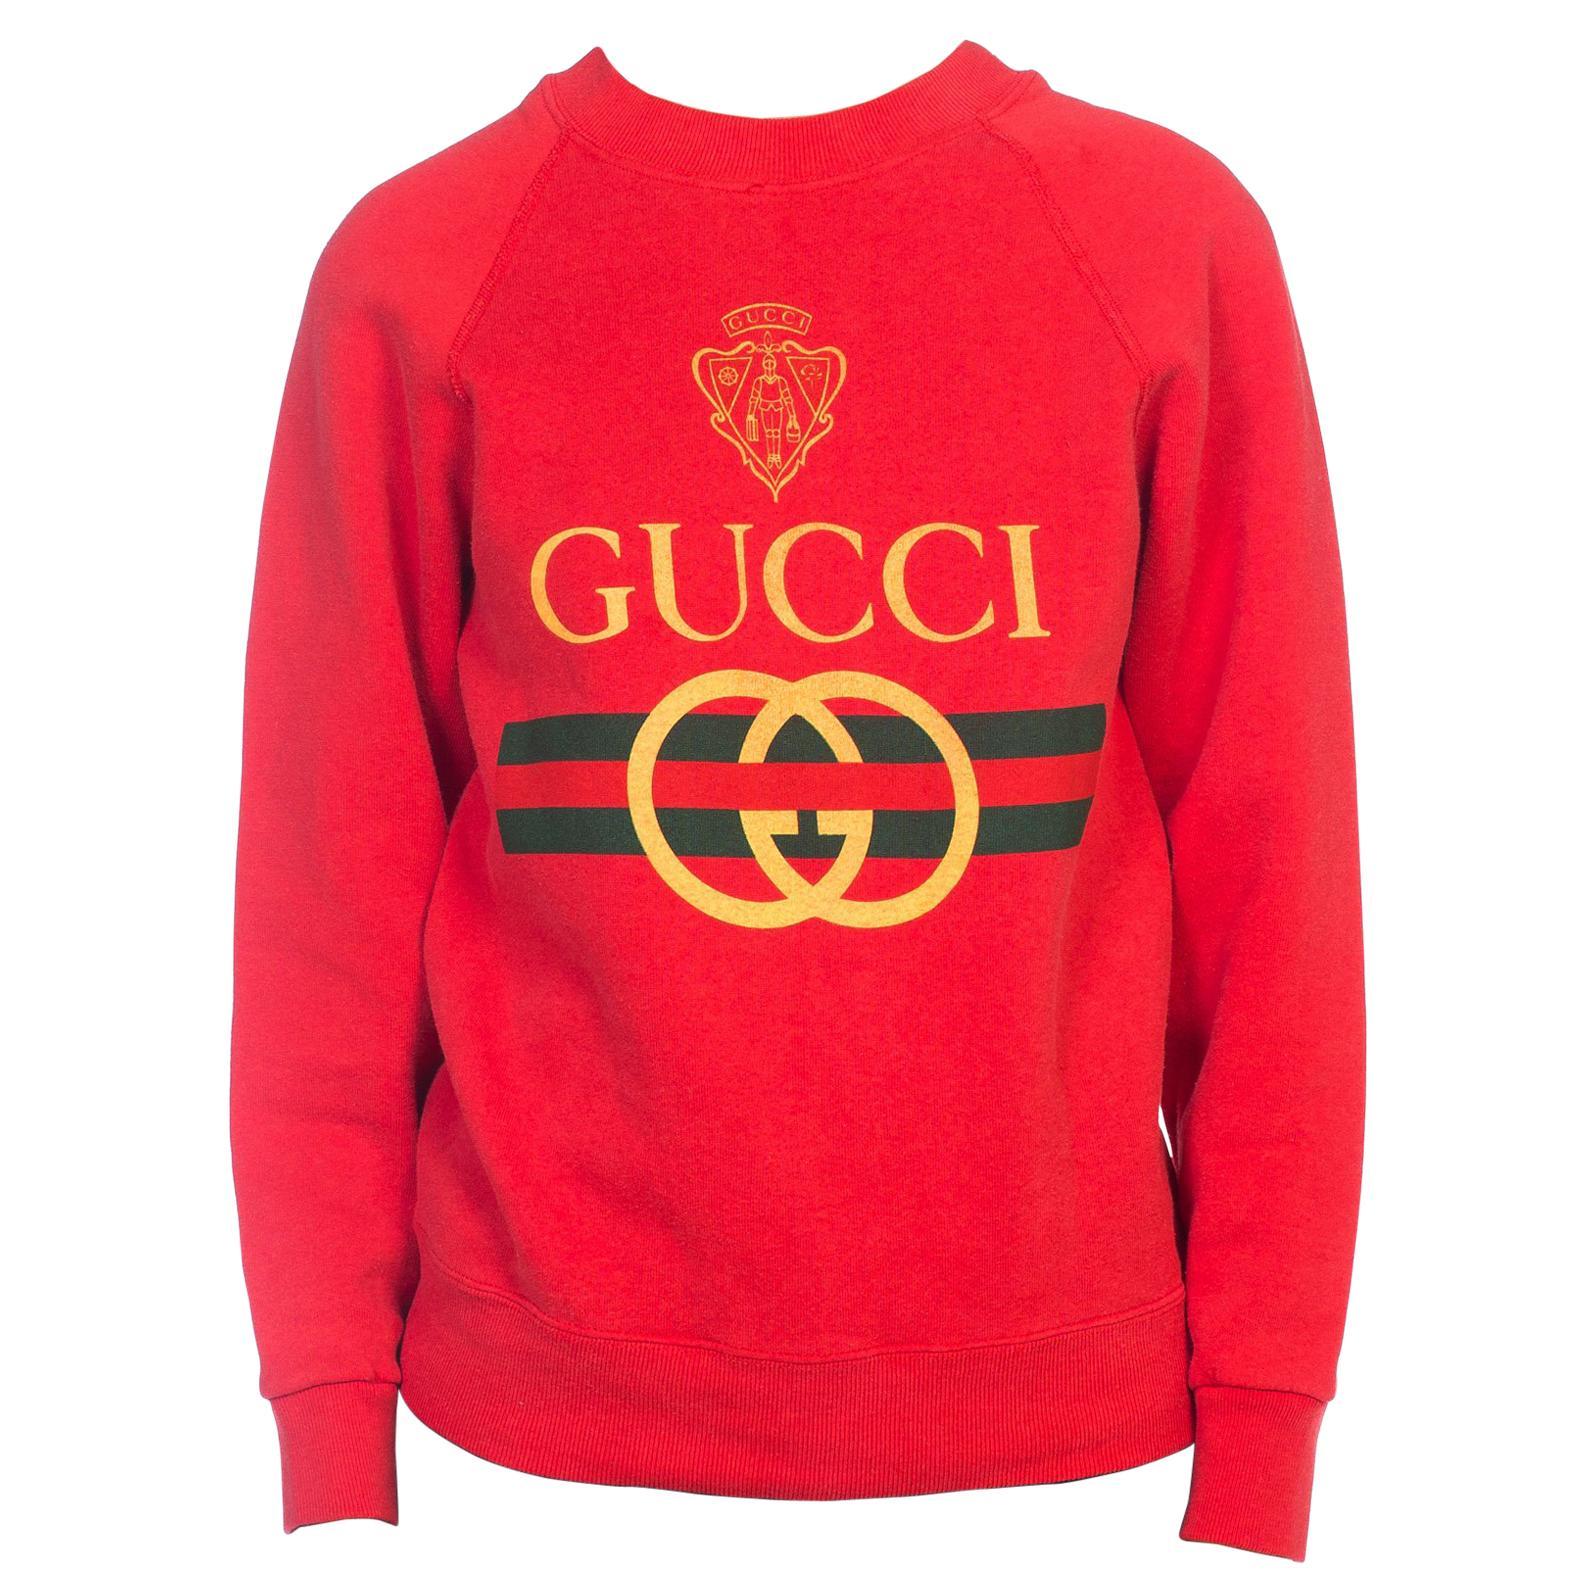 1980s Red Bootleg Gucci Sweatshirt